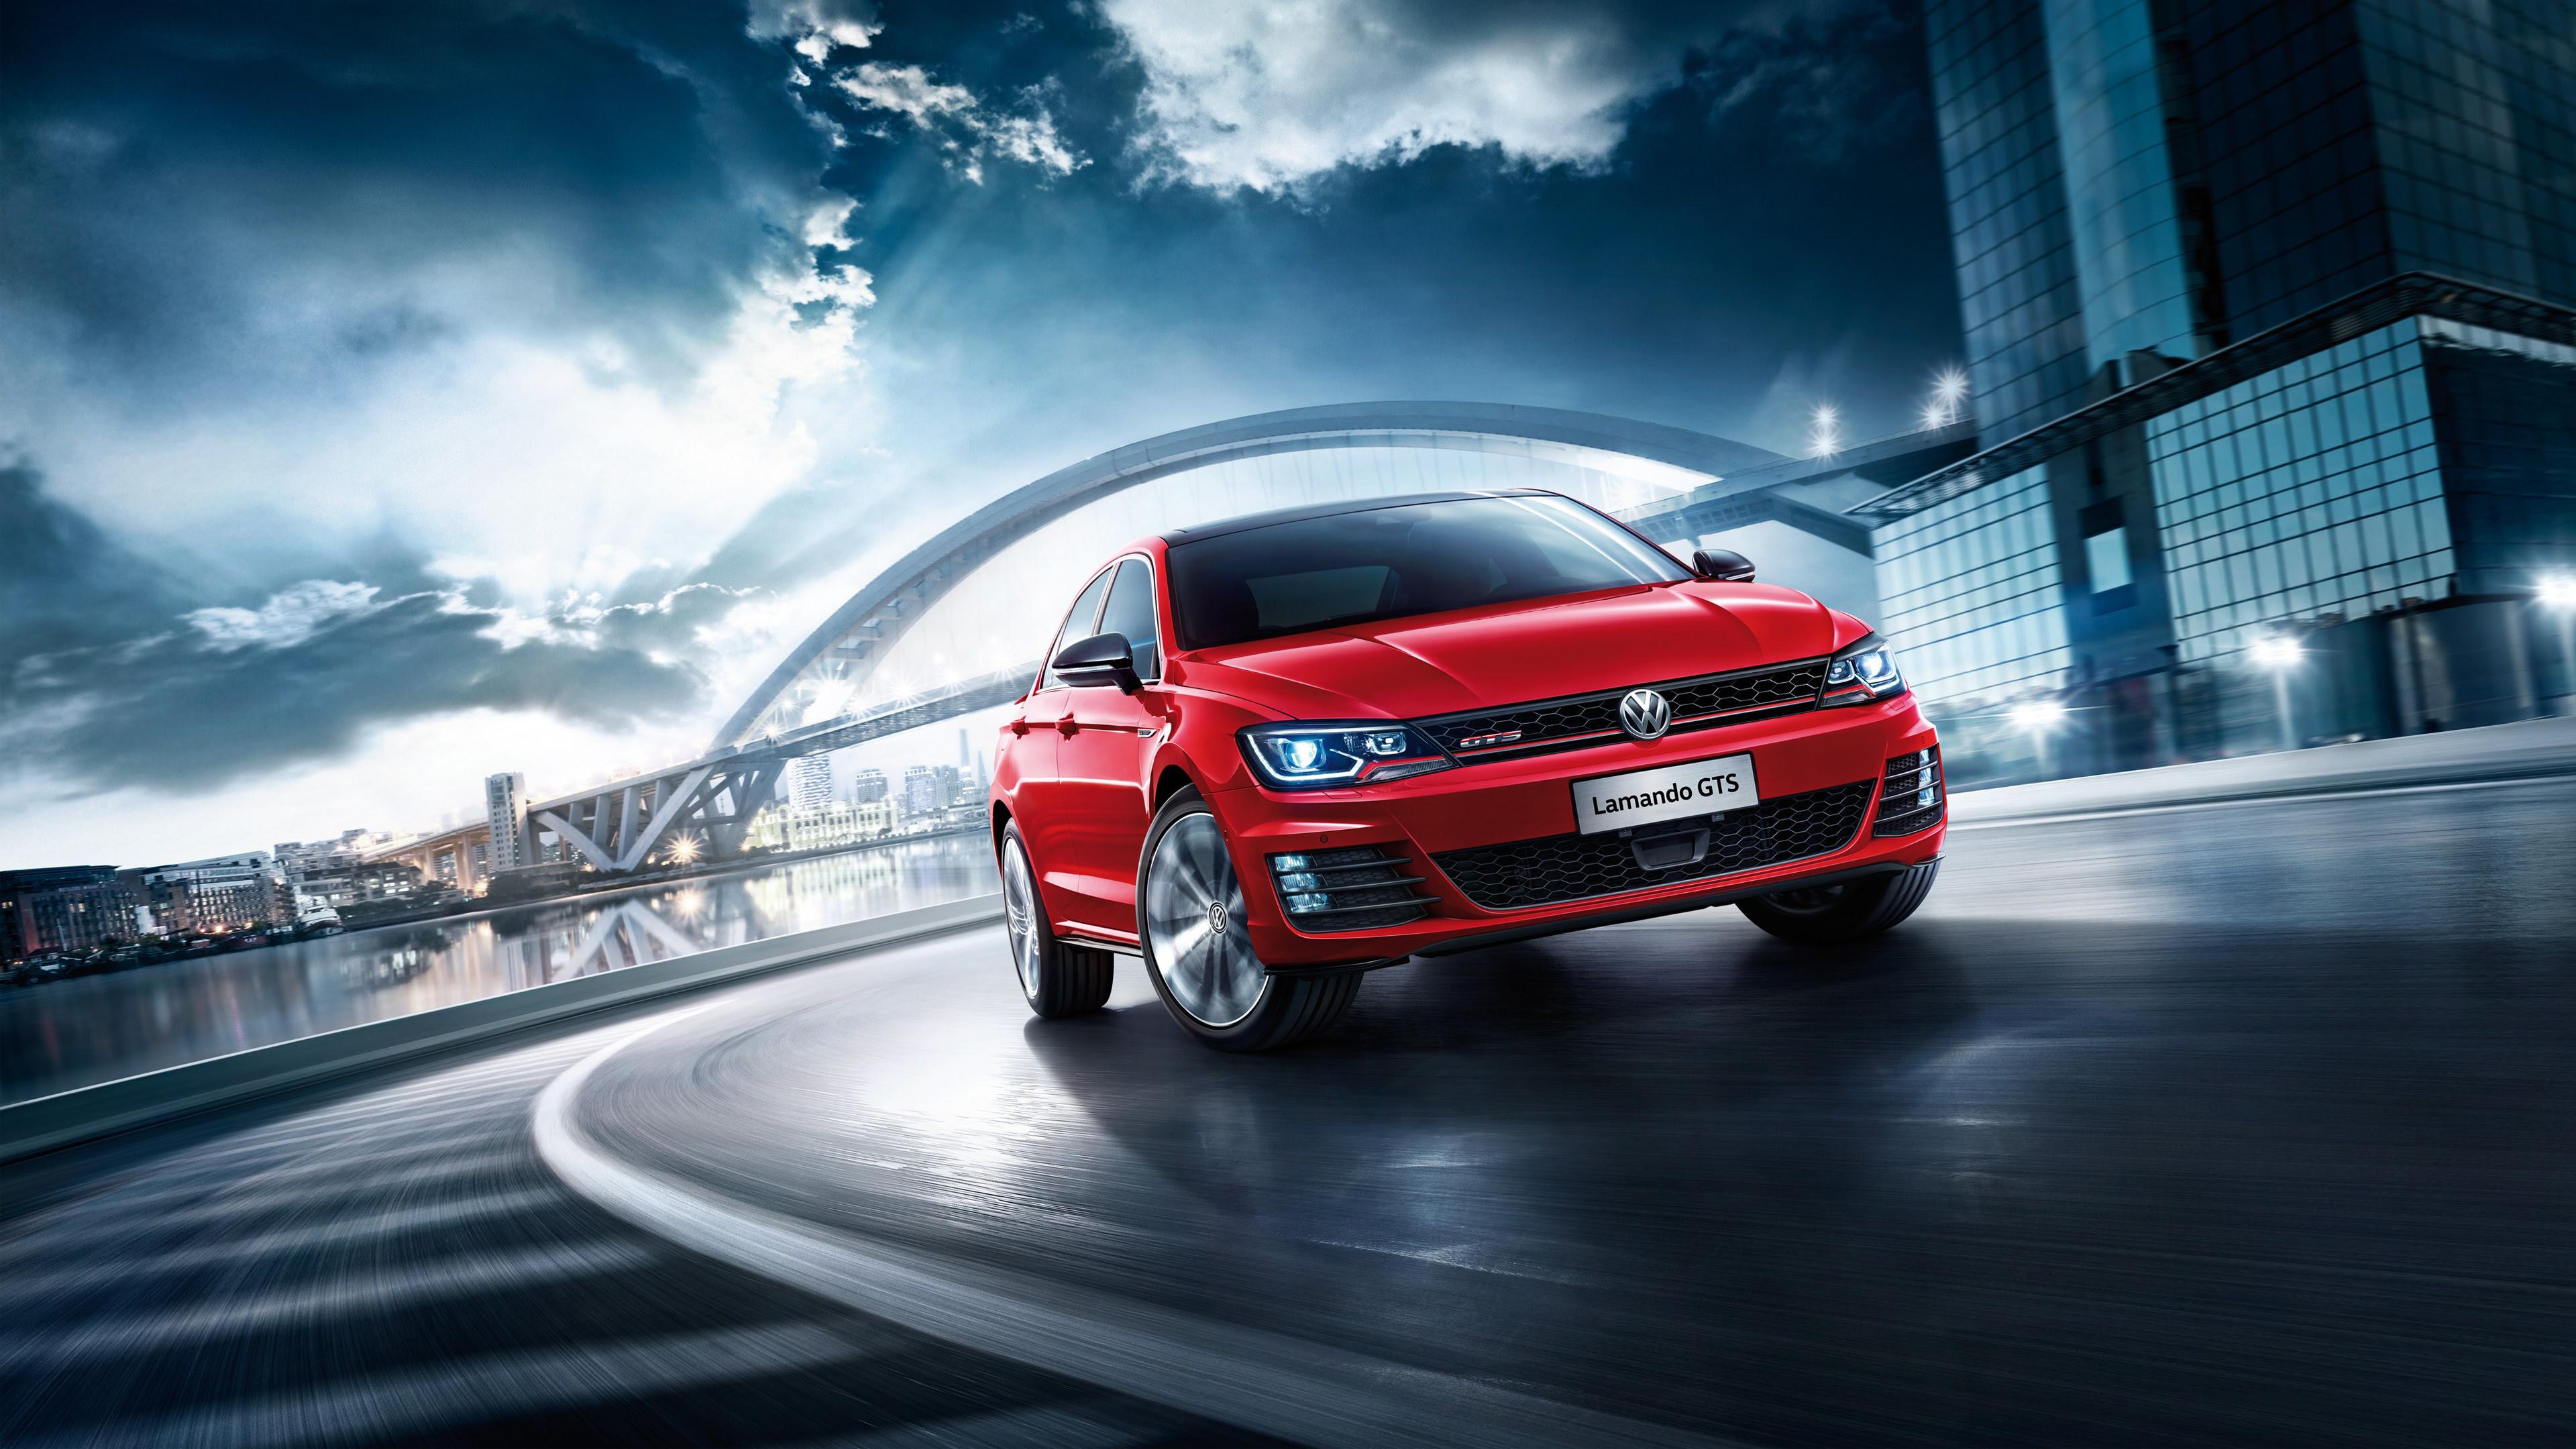 2017 Volkswagen Lamando GTS Wallpaper  HD Car Wallpapers  ID 6497